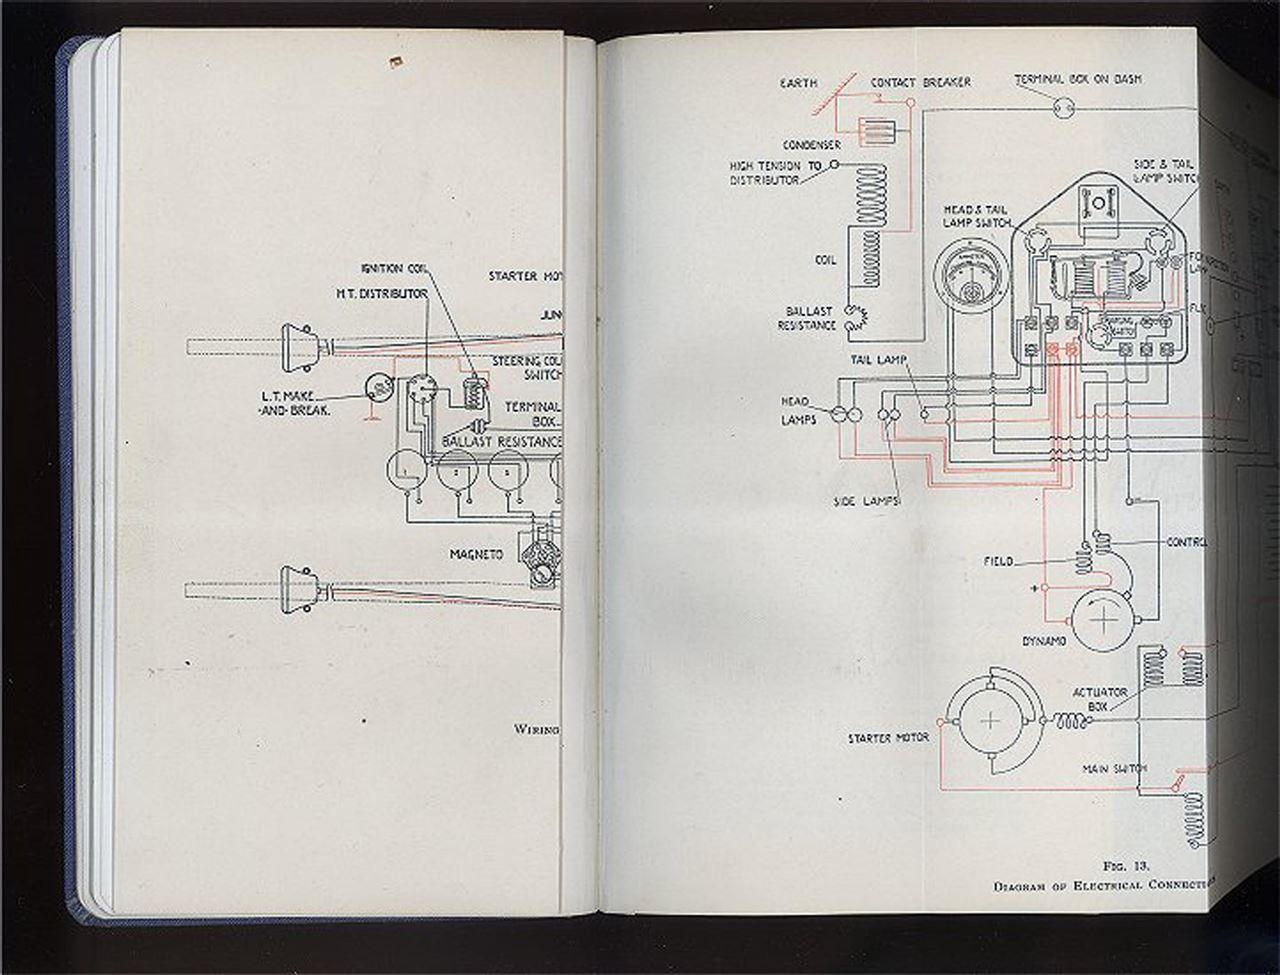 Rolls Royce Phantom Wiring Diagram